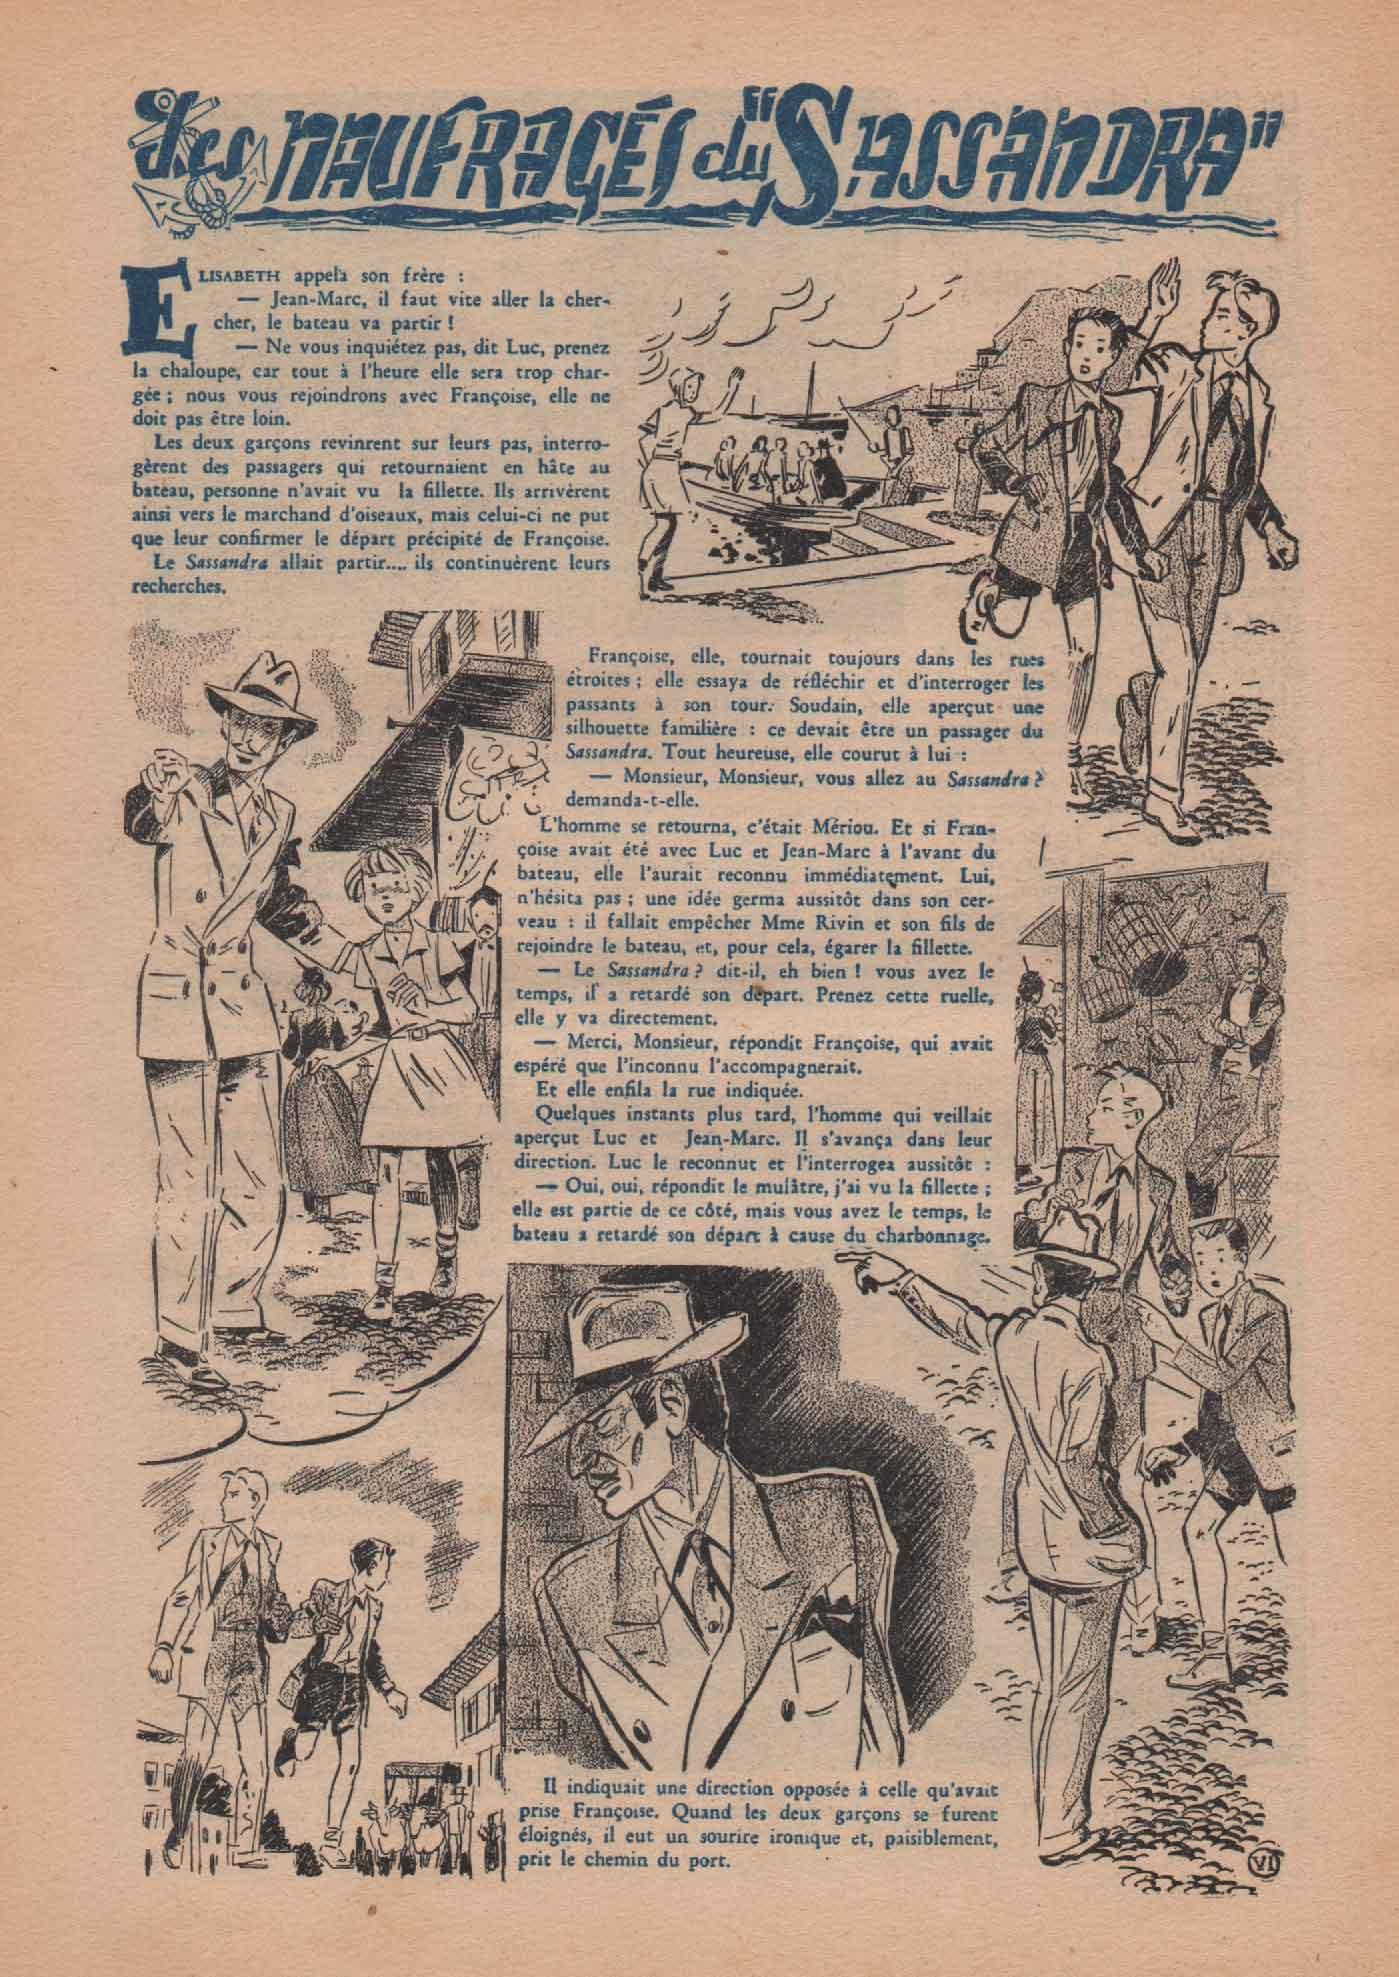 "« Les Naufragés du ""Sassandra"" » Bernadette n° 271 (10/02/1952)."